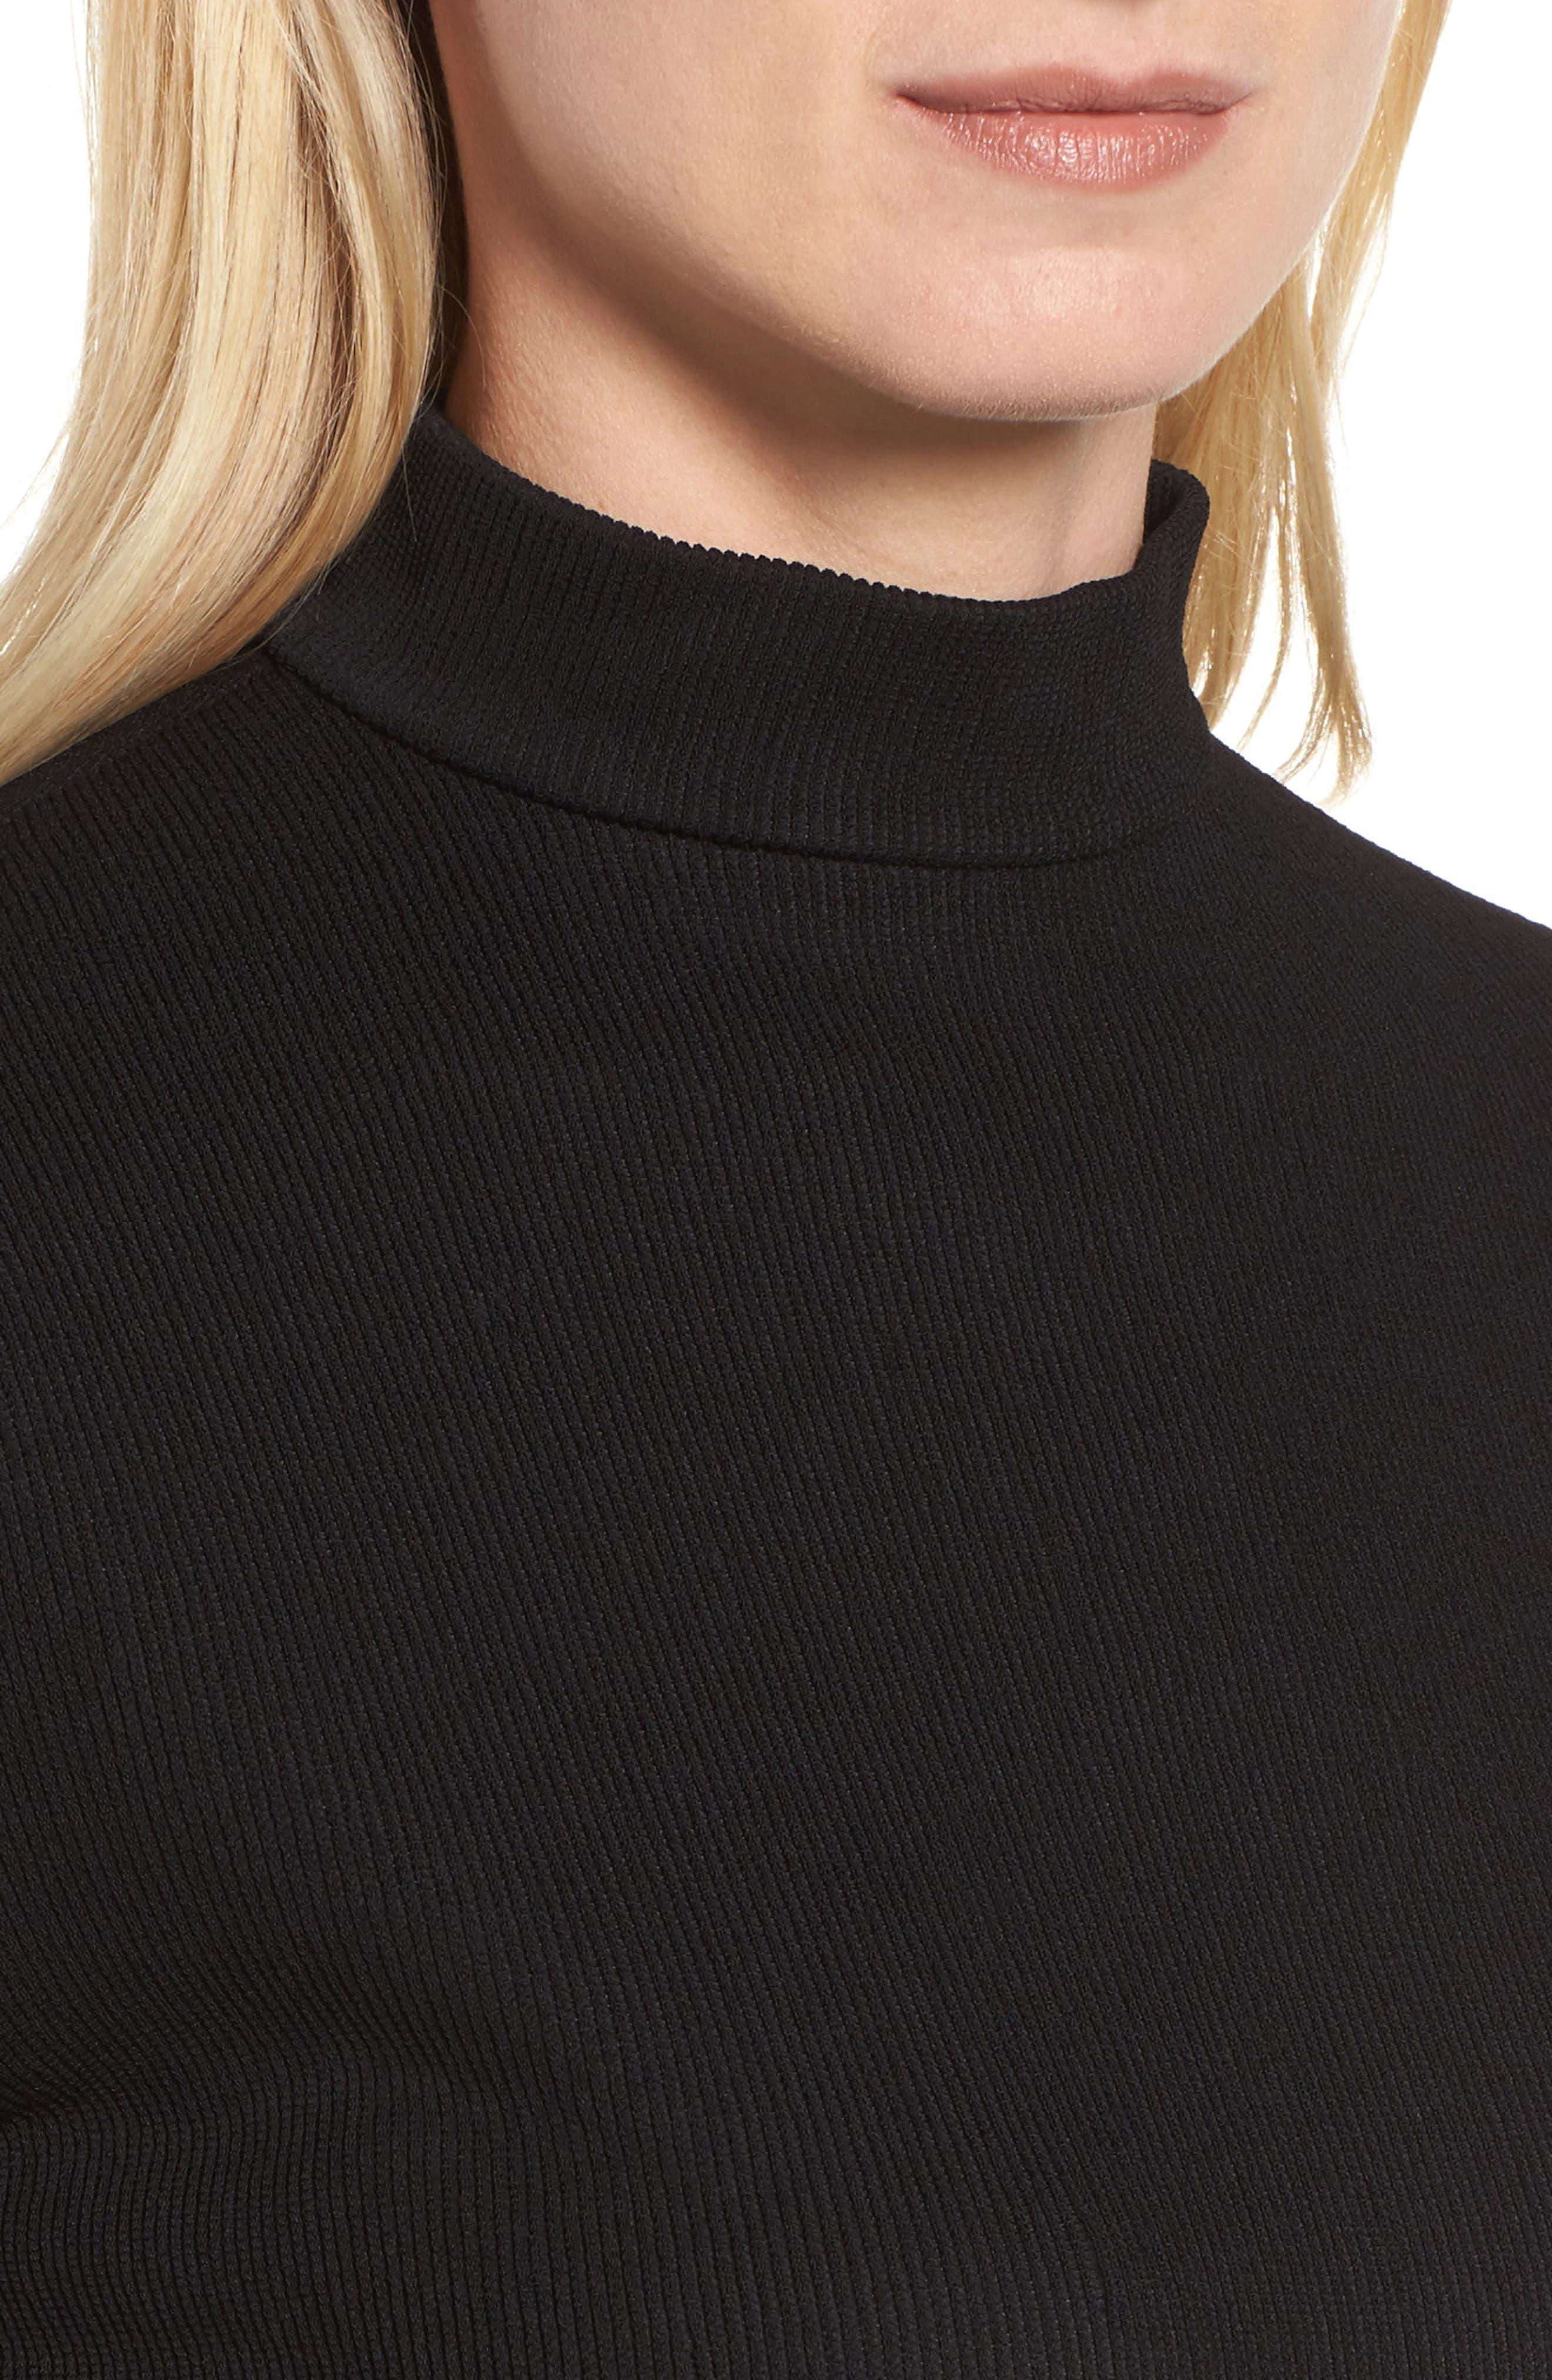 Etelina Sweater,                             Alternate thumbnail 4, color,                             Black